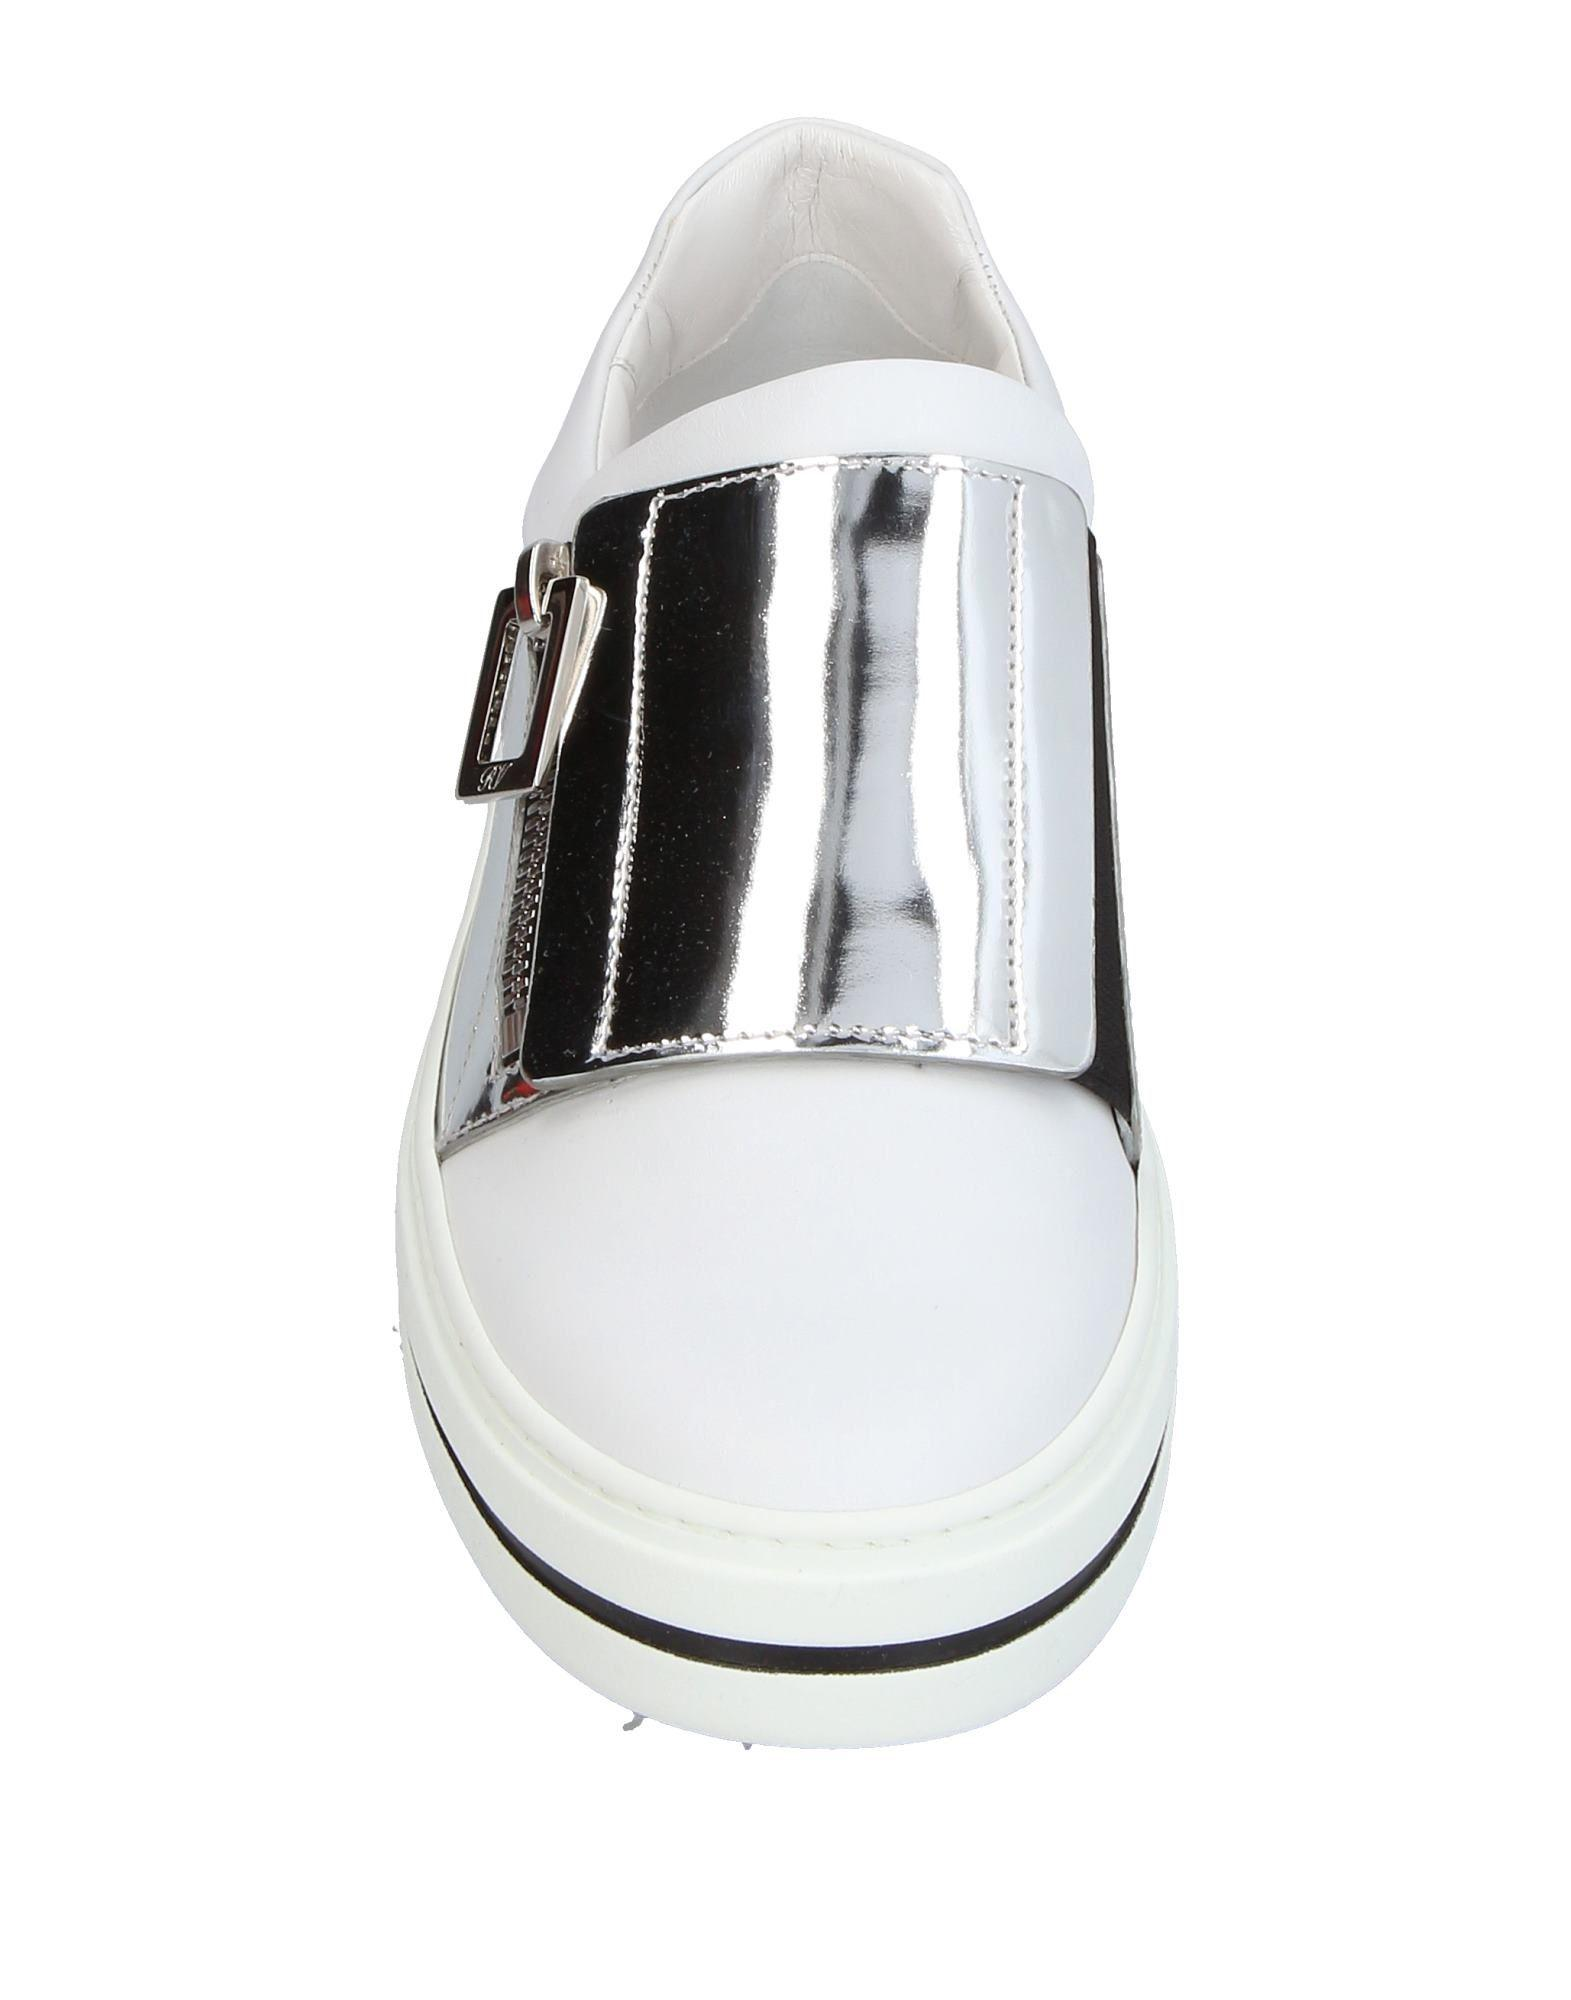 Roger Vivier Leather Low-tops & Sneakers in Silver (Metallic)